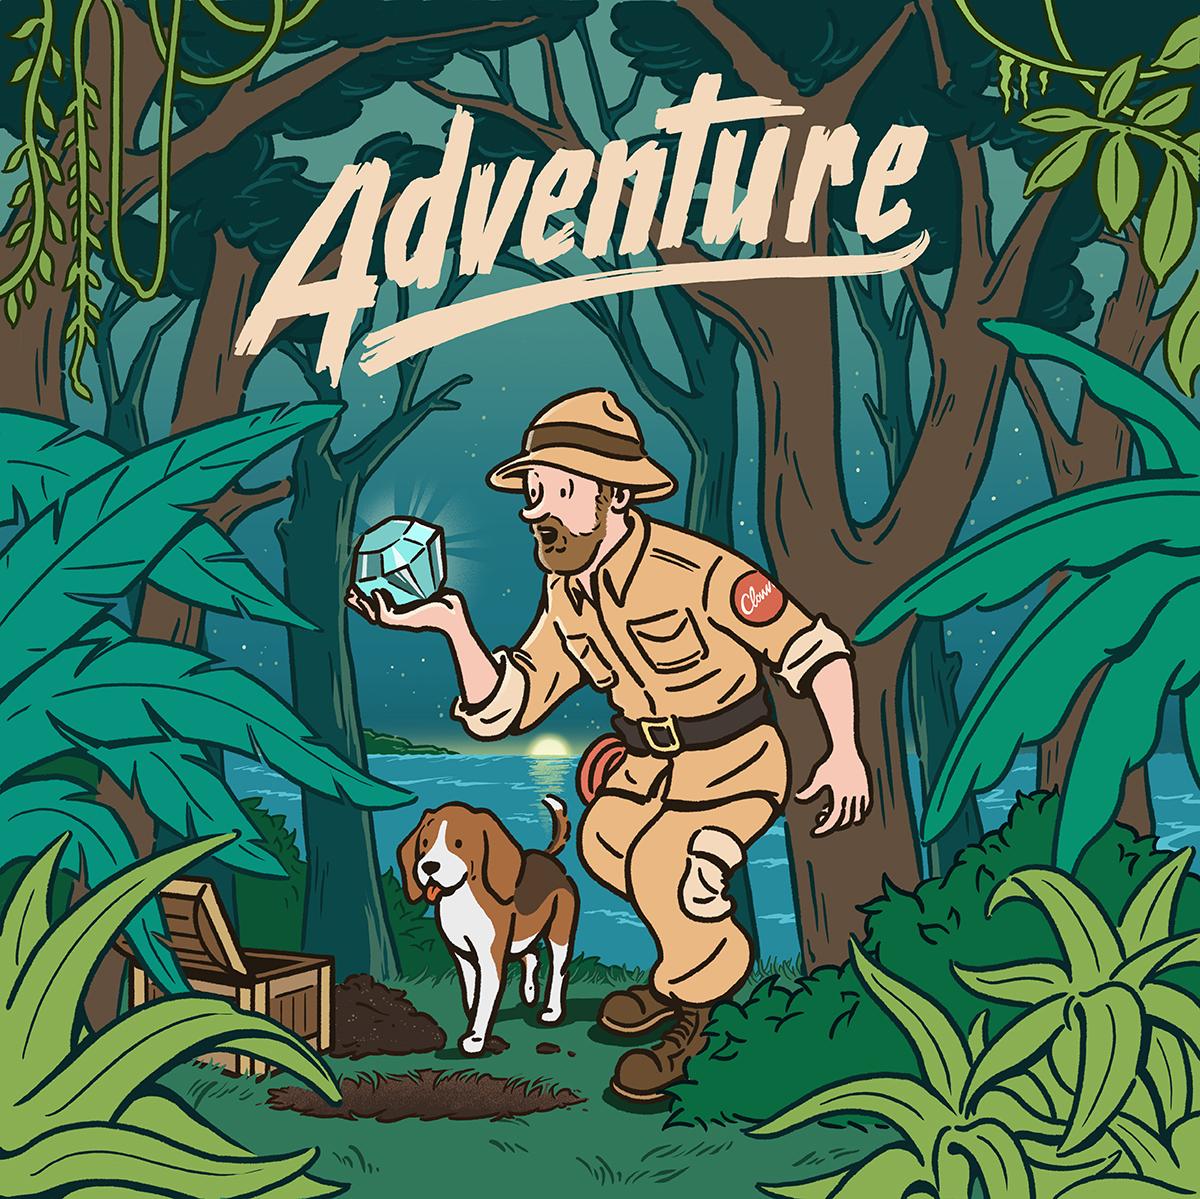 adventure_3.5_ver.2_crop_1200px